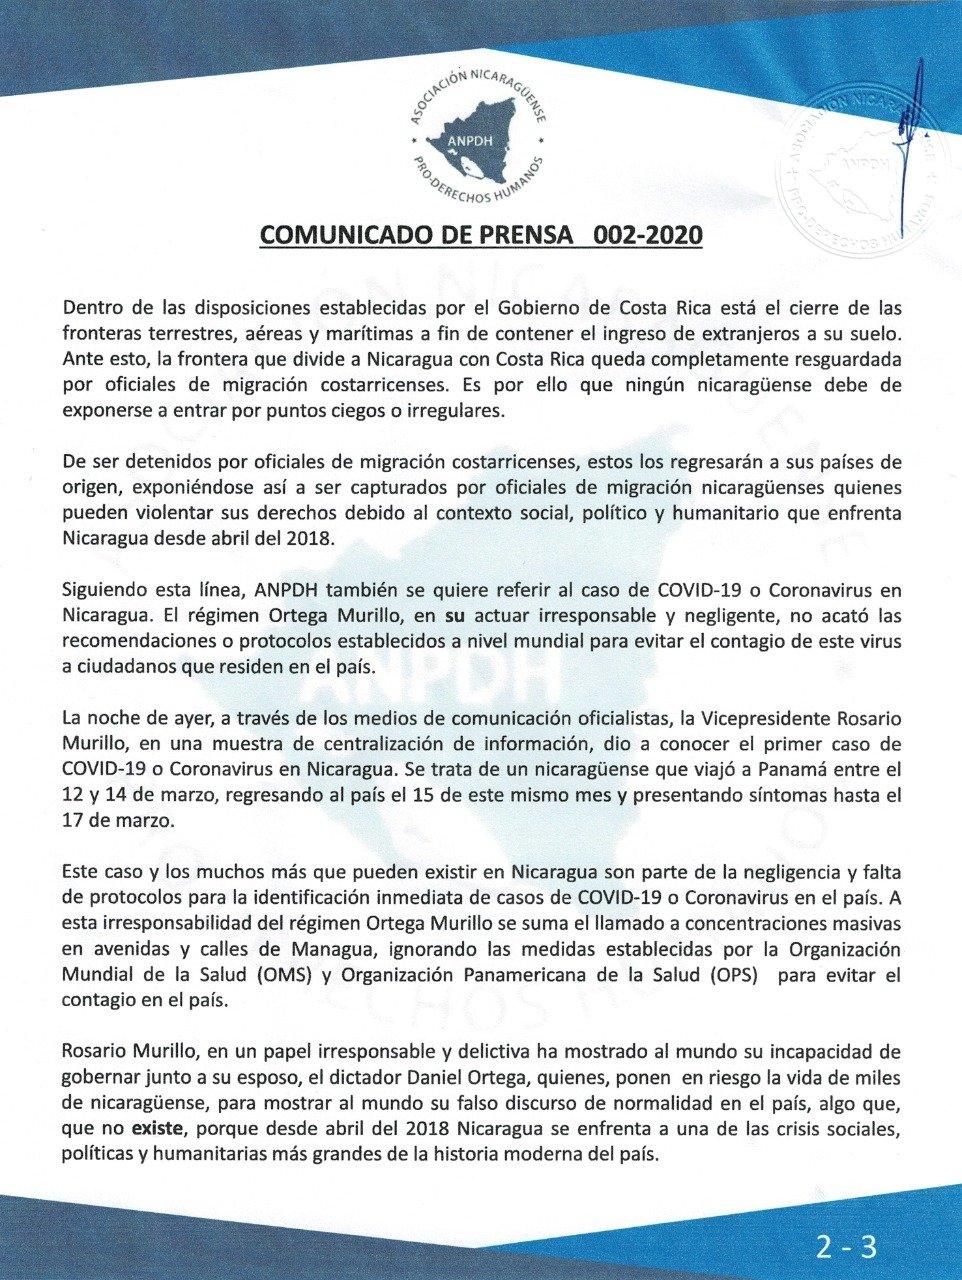 COMUNICADO-DE-PRENSA-02-2020-02.jpg